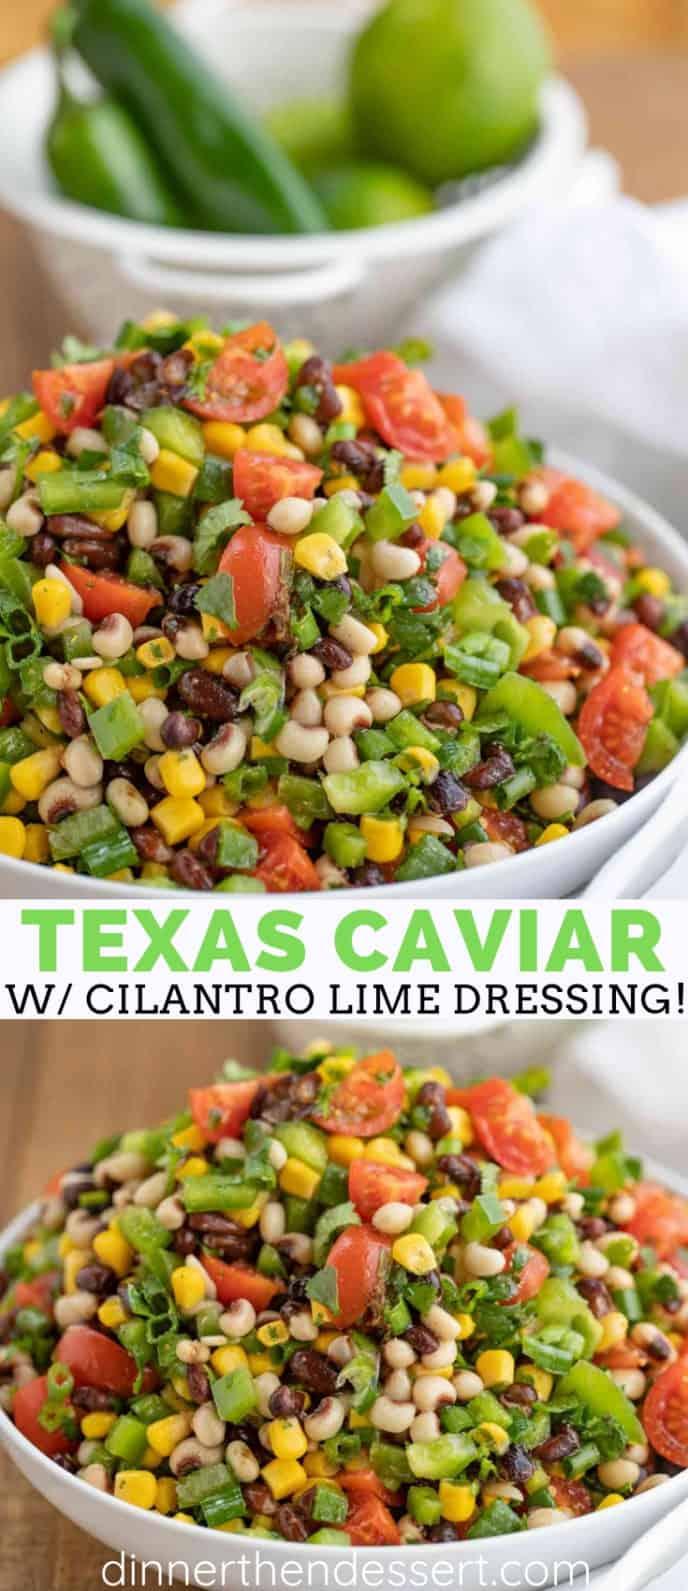 Easy Texas Caviar Dip